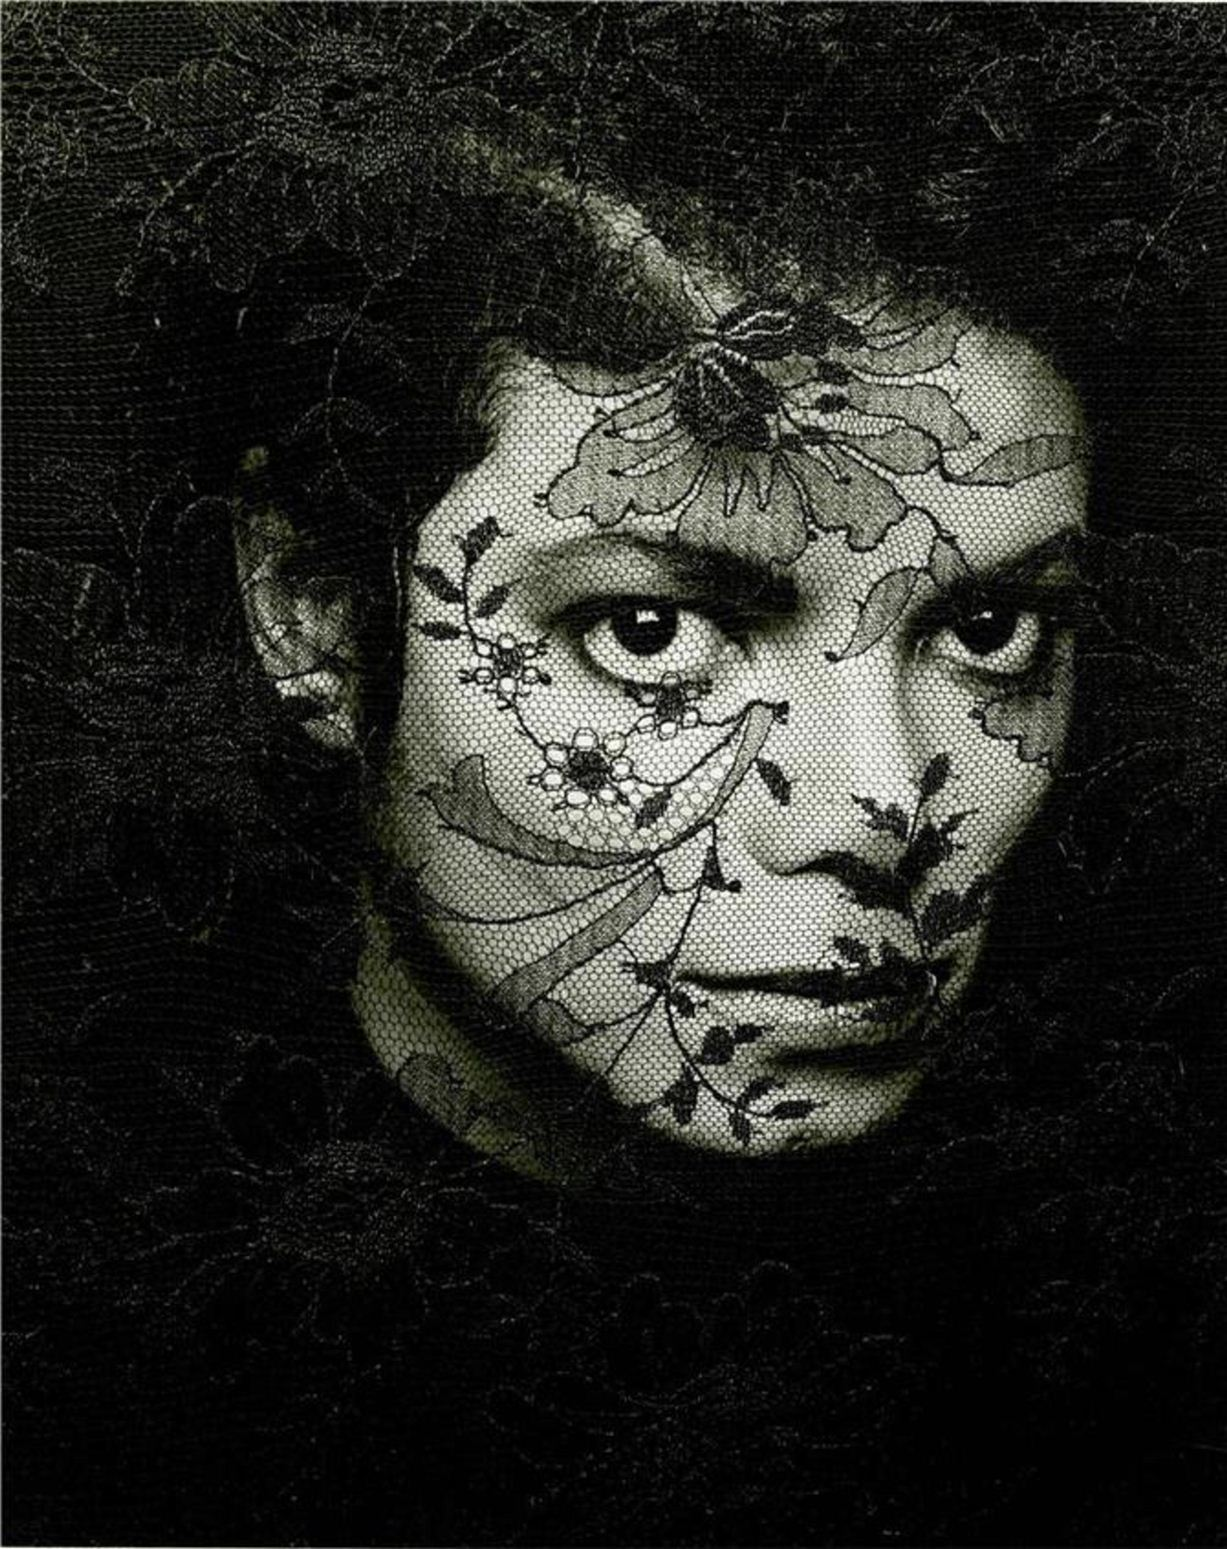 Michael Jackson / Майкл Джексон - портрет фотографа Грега Гормана / Greg Gorman